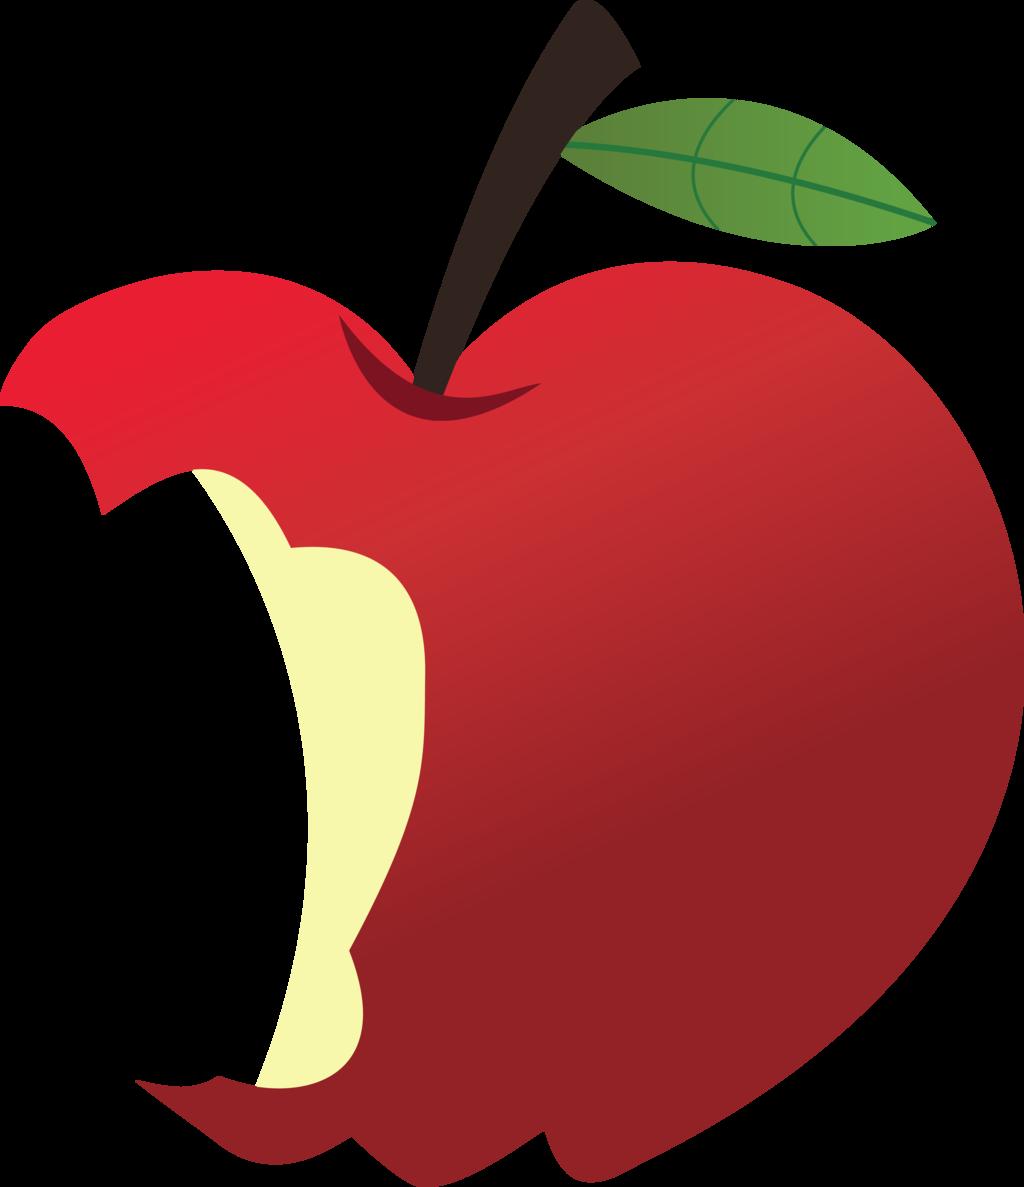 Apple imagens de clip. Pear clipart bitten